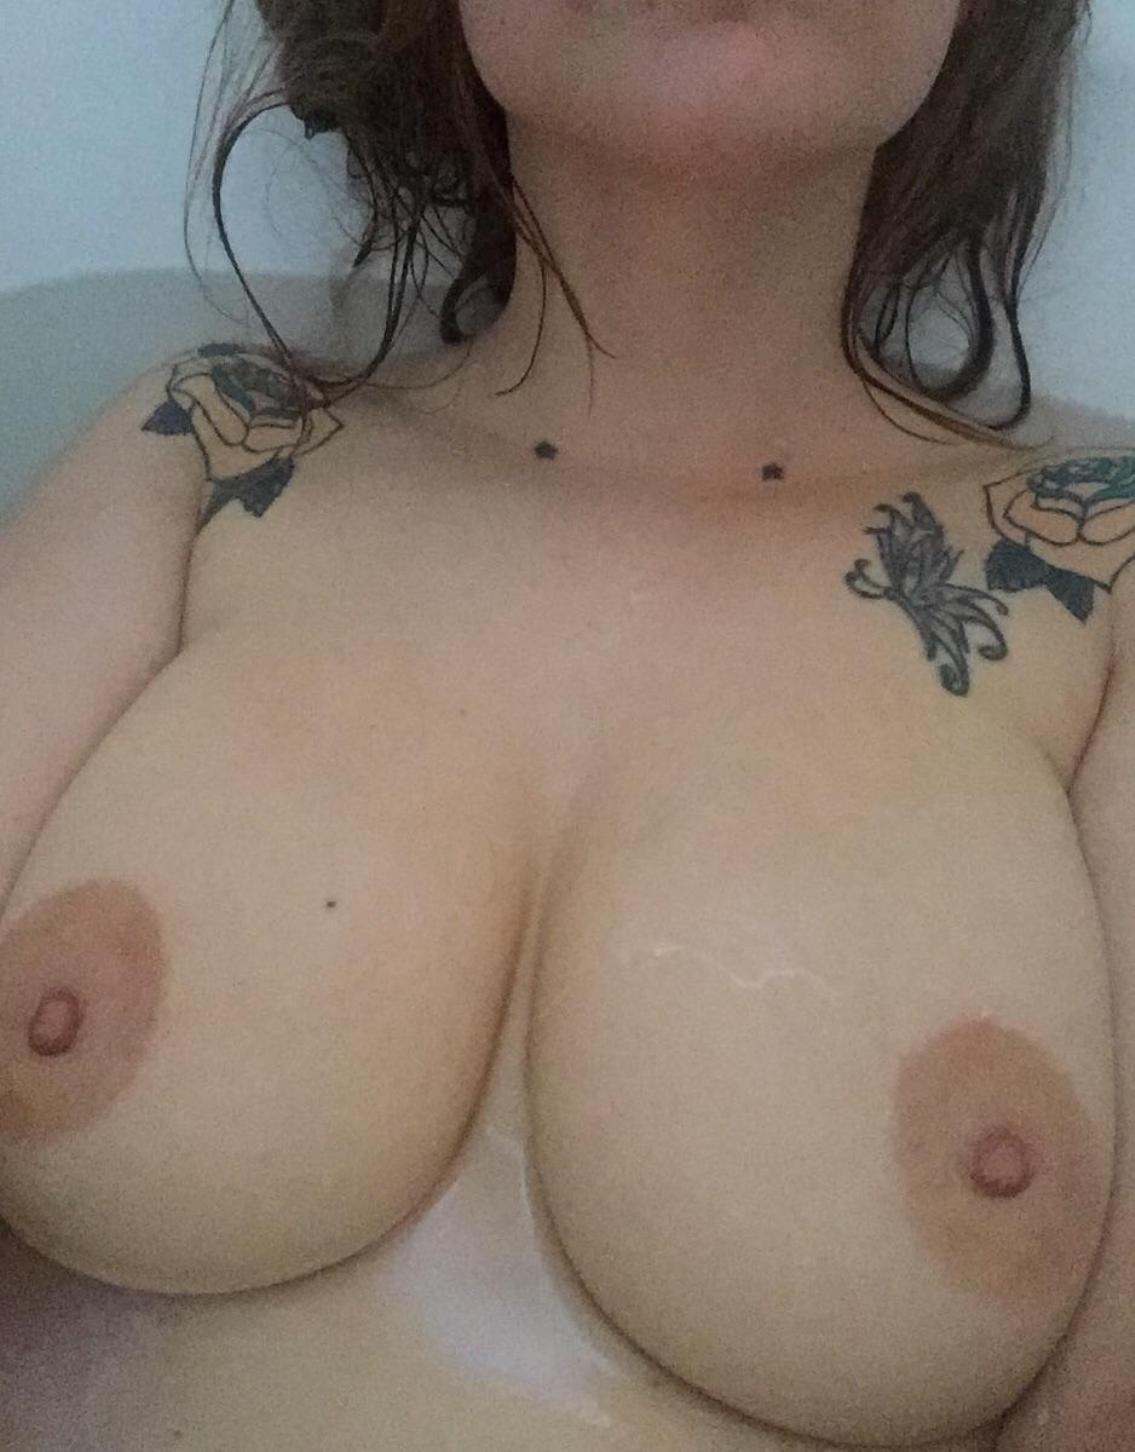 Sexy female displays perfect breasts in a bathtub